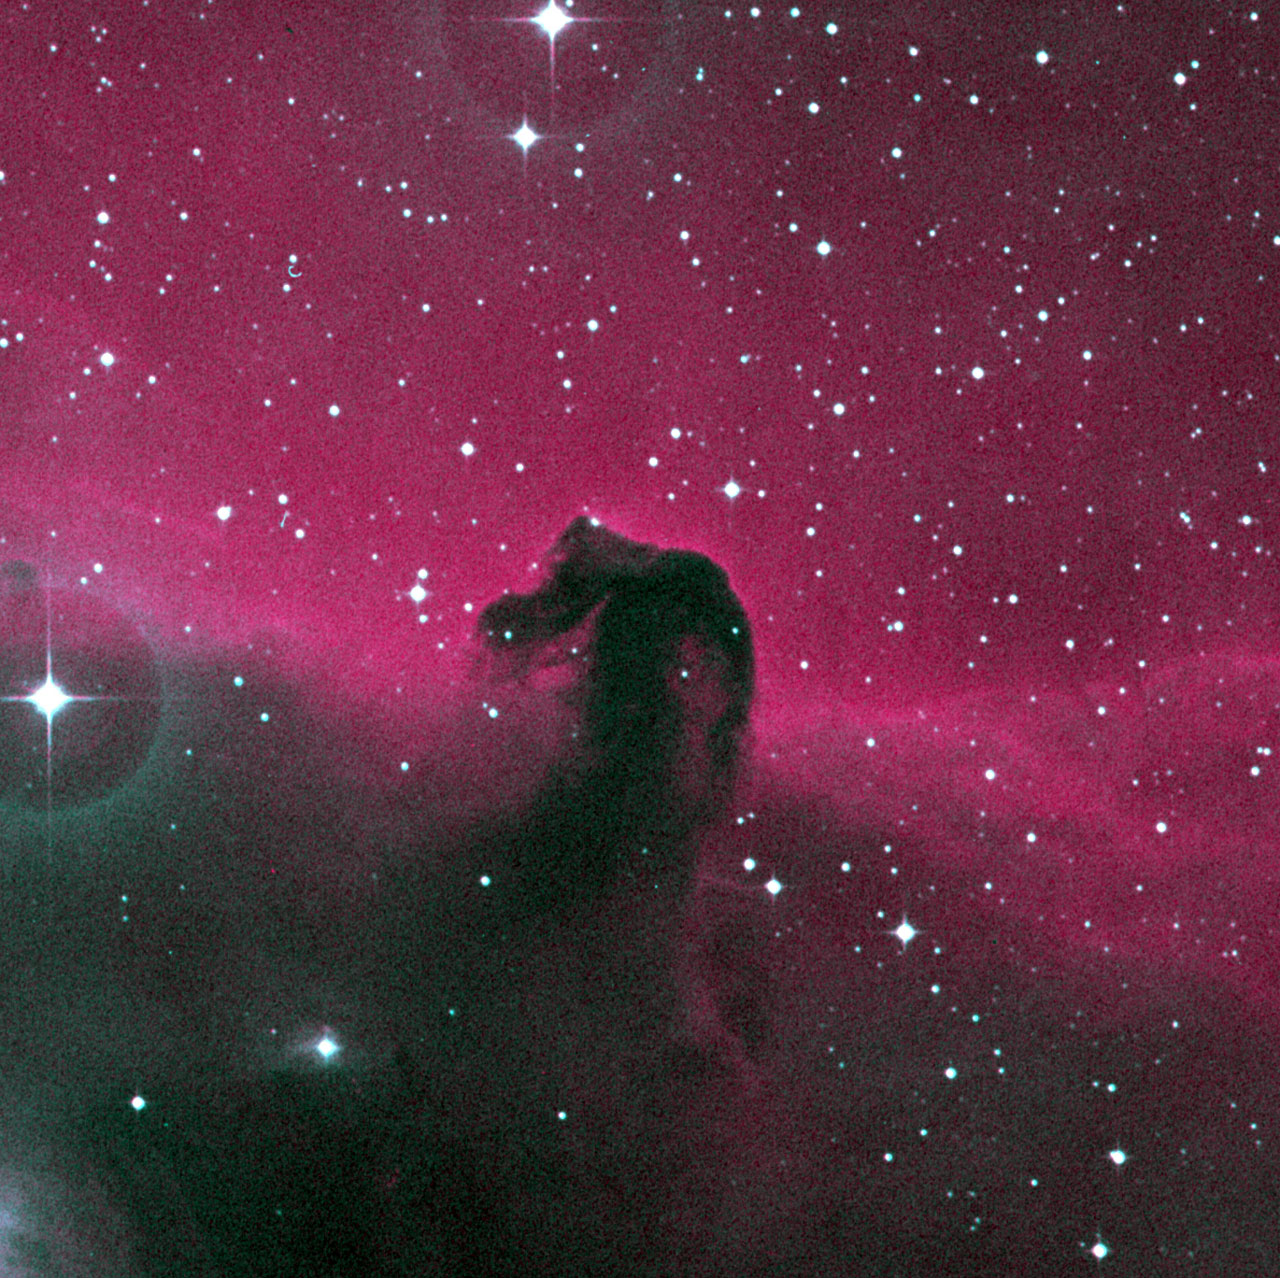 Good   Wallpaper Horse Nebula - Horsehead-Nebula-Wallpaper-HD-24  You Should Have_152118.jpg